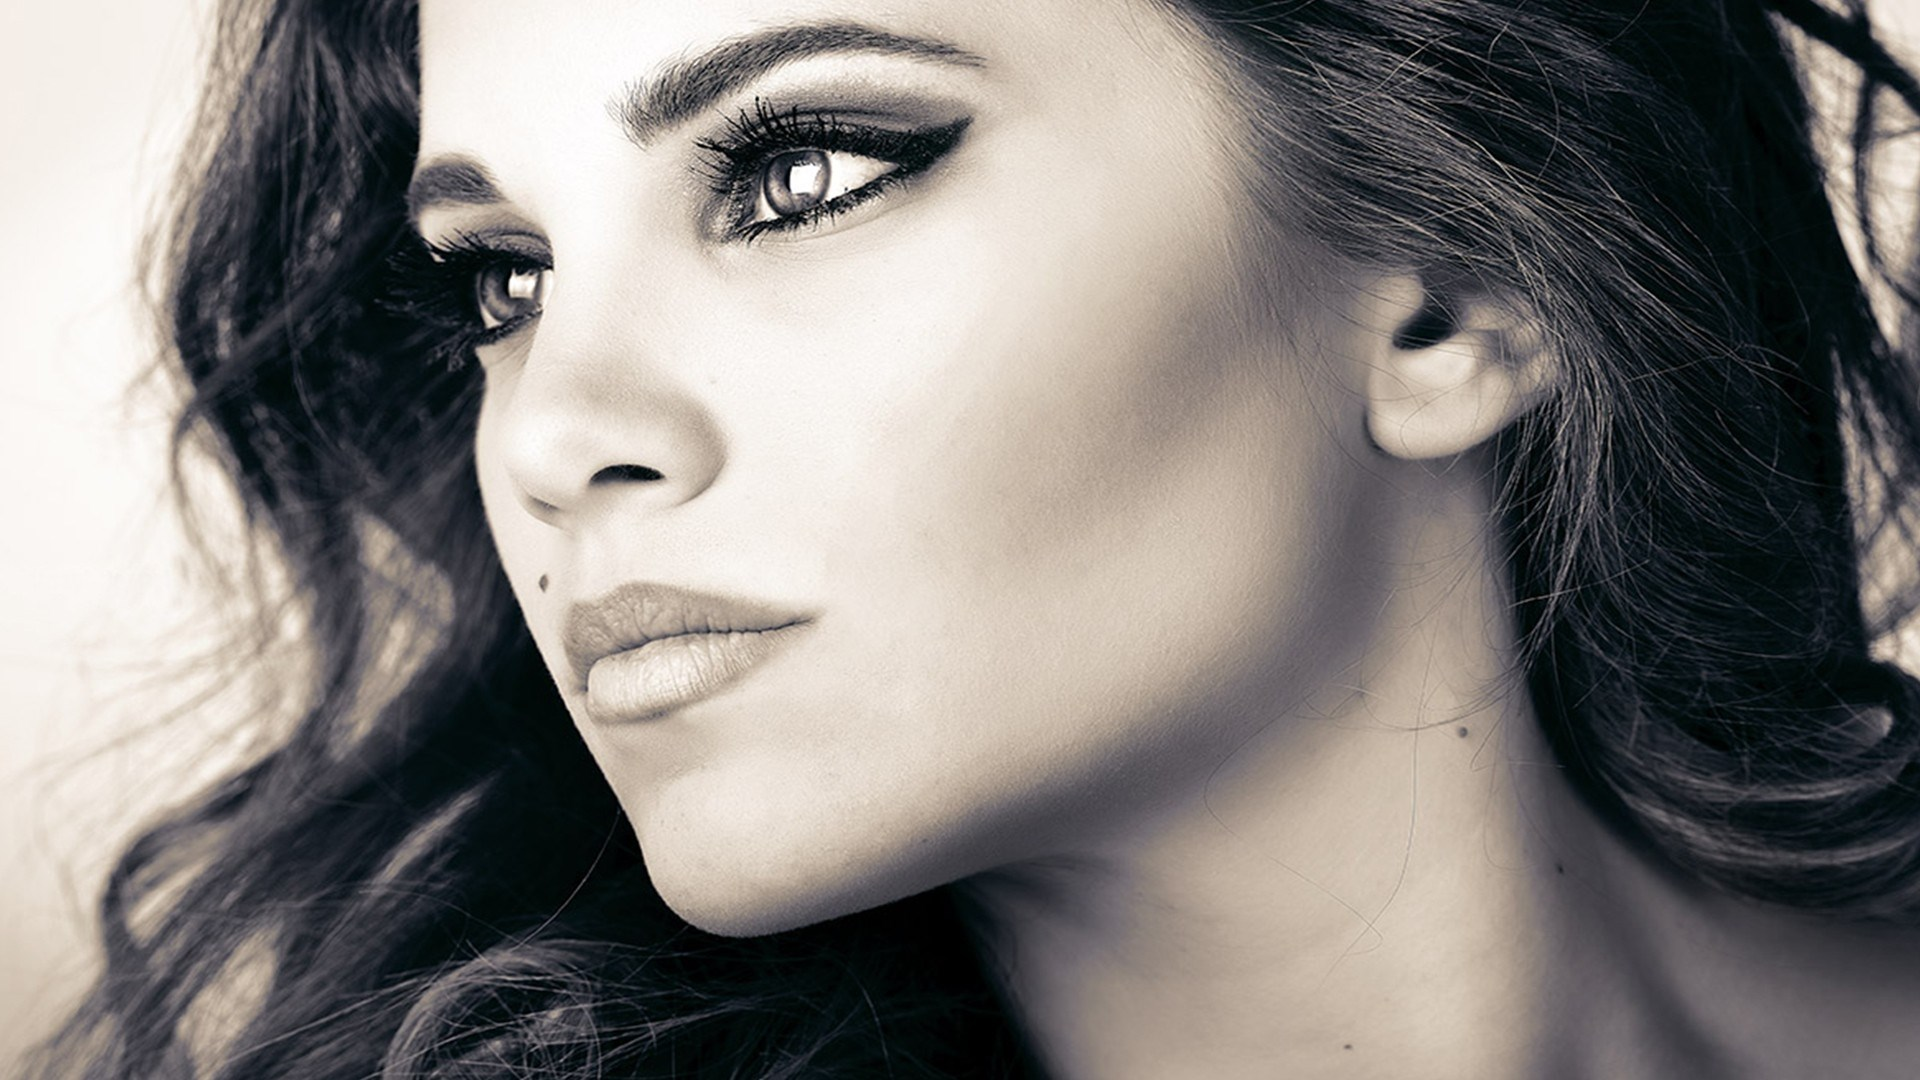 Beauty Girl Portrait Photo